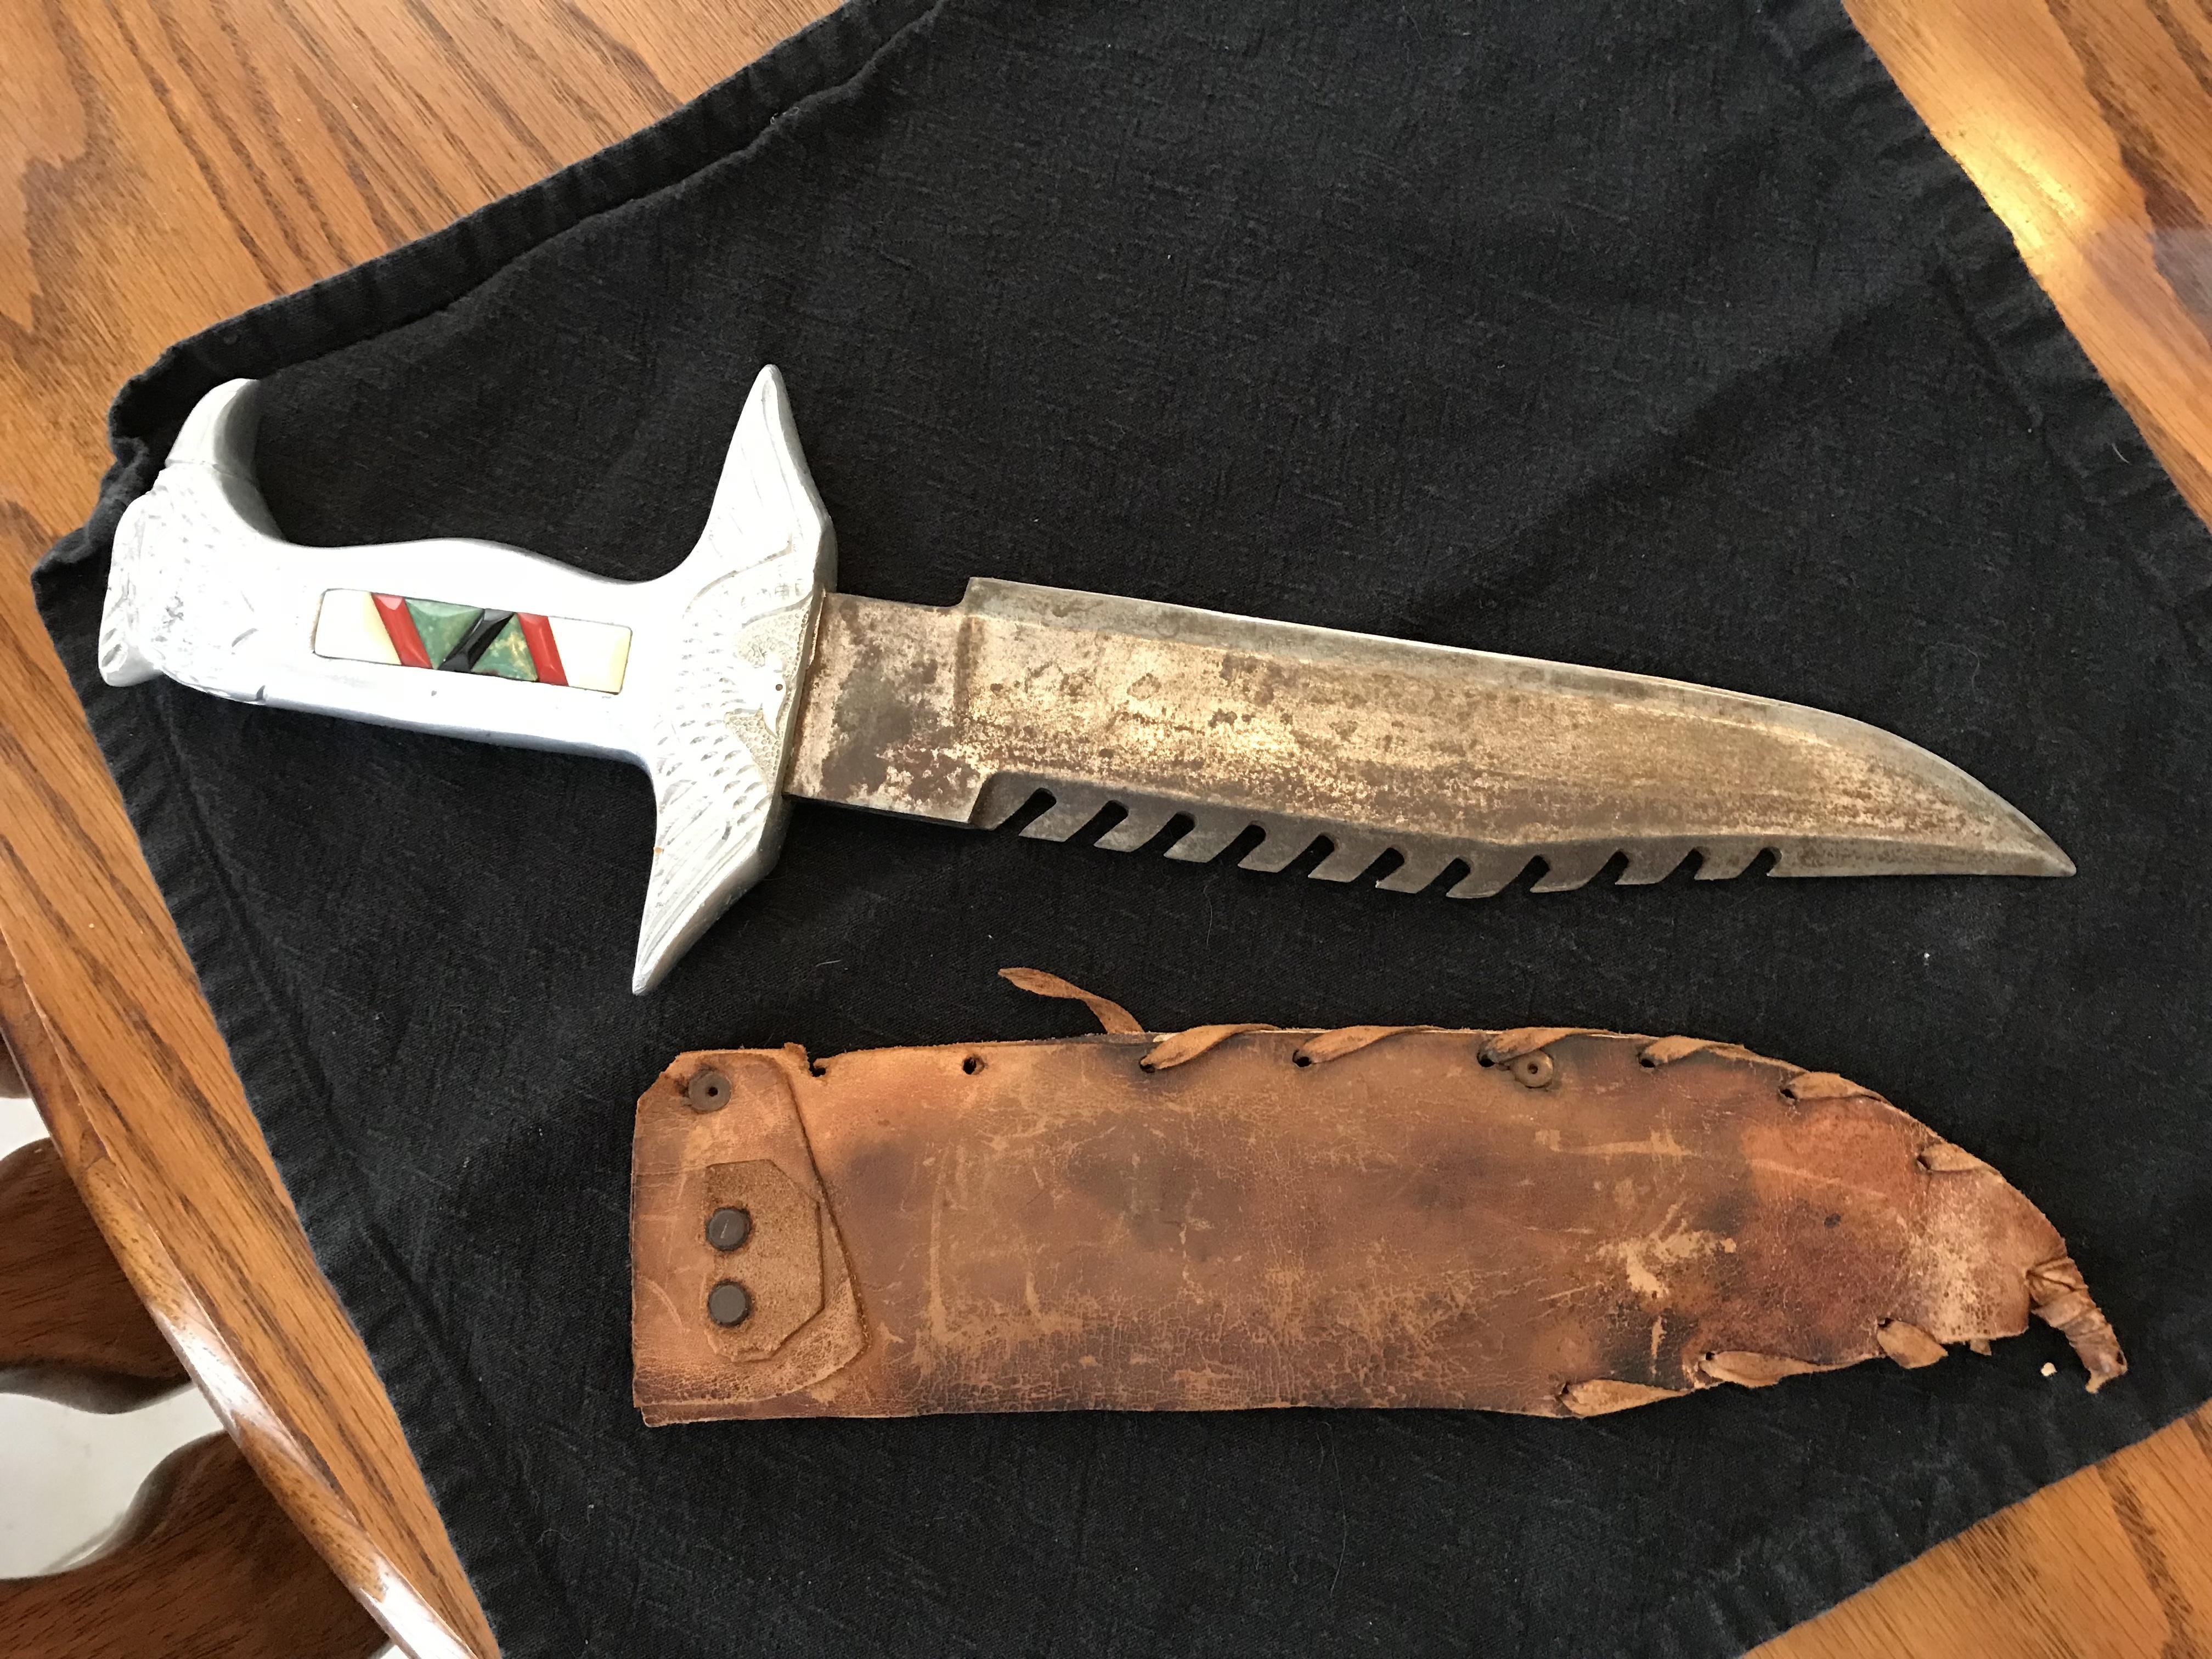 Is this knife worth anything?-dcb63e0f-1acc-49b1-8222-f269112656c5.jpeg